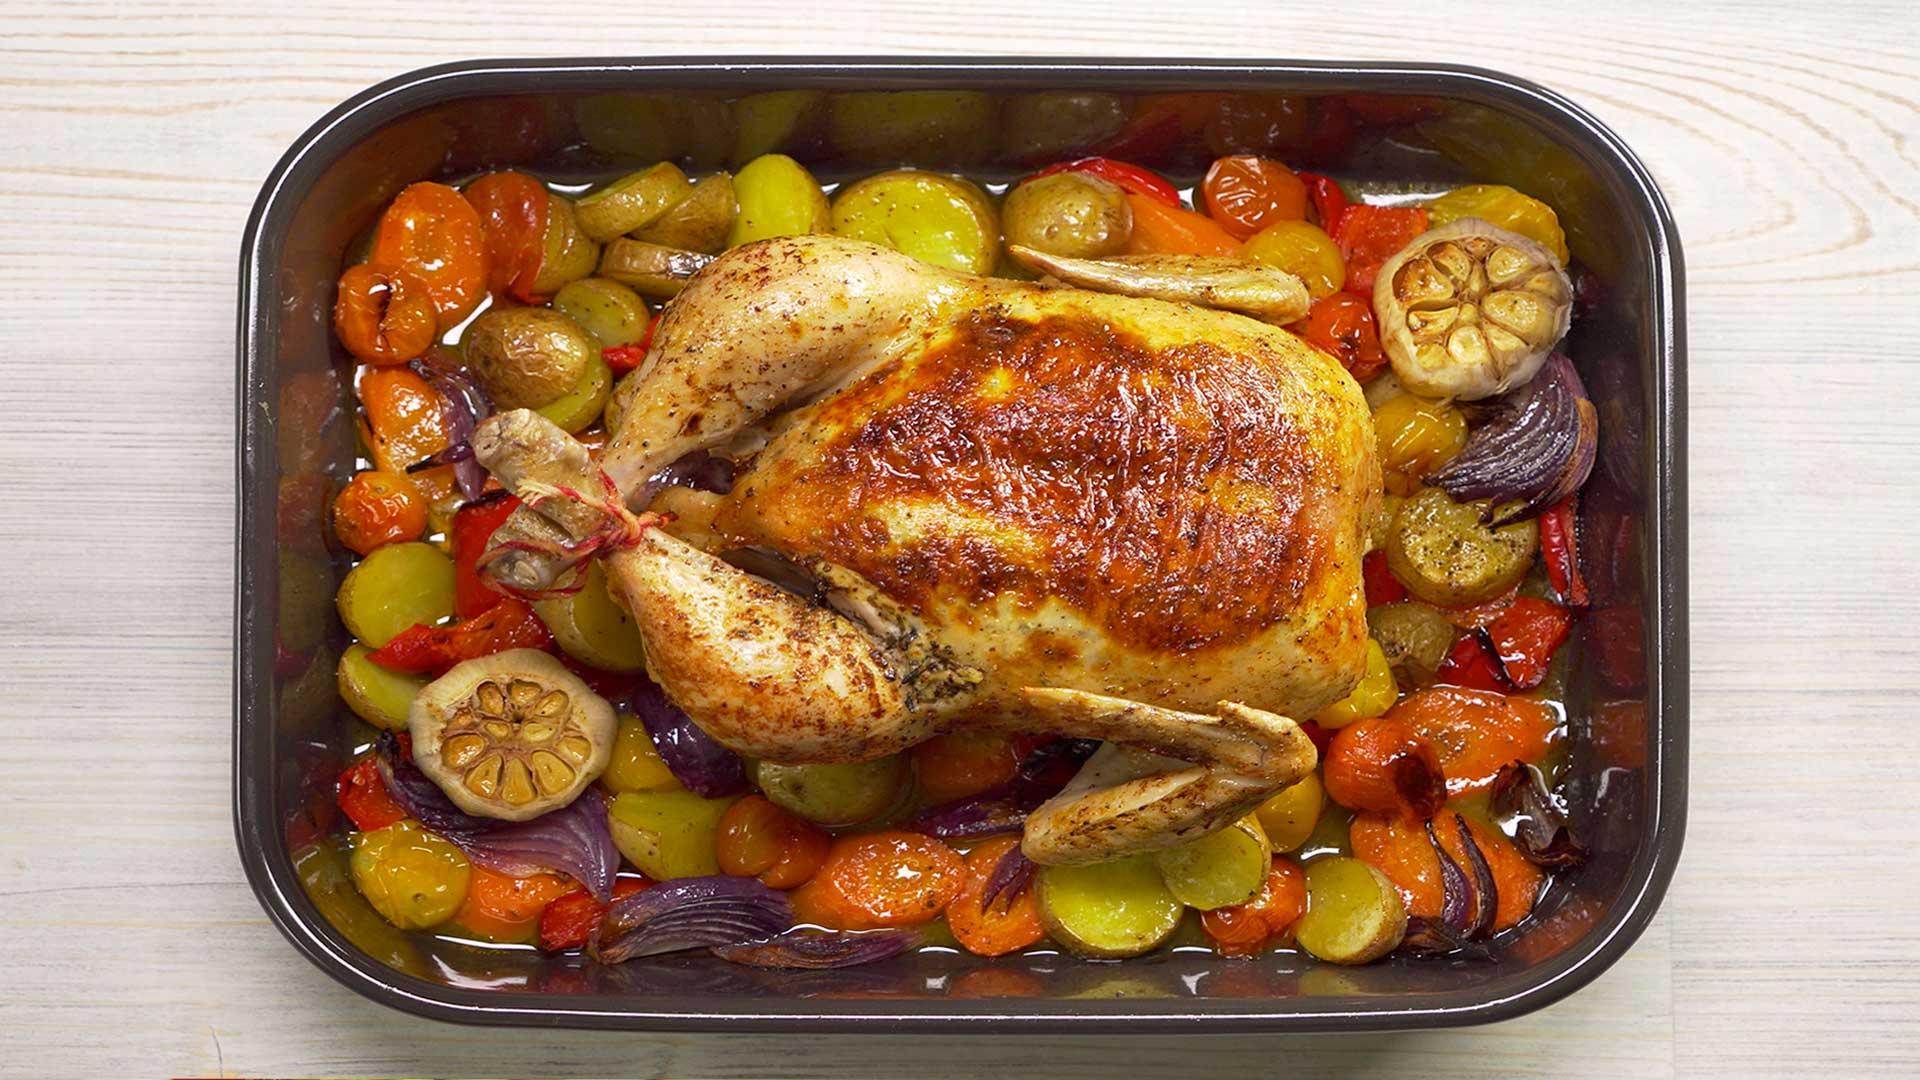 Курица с овощами запеченная в духовке. Французская кухня